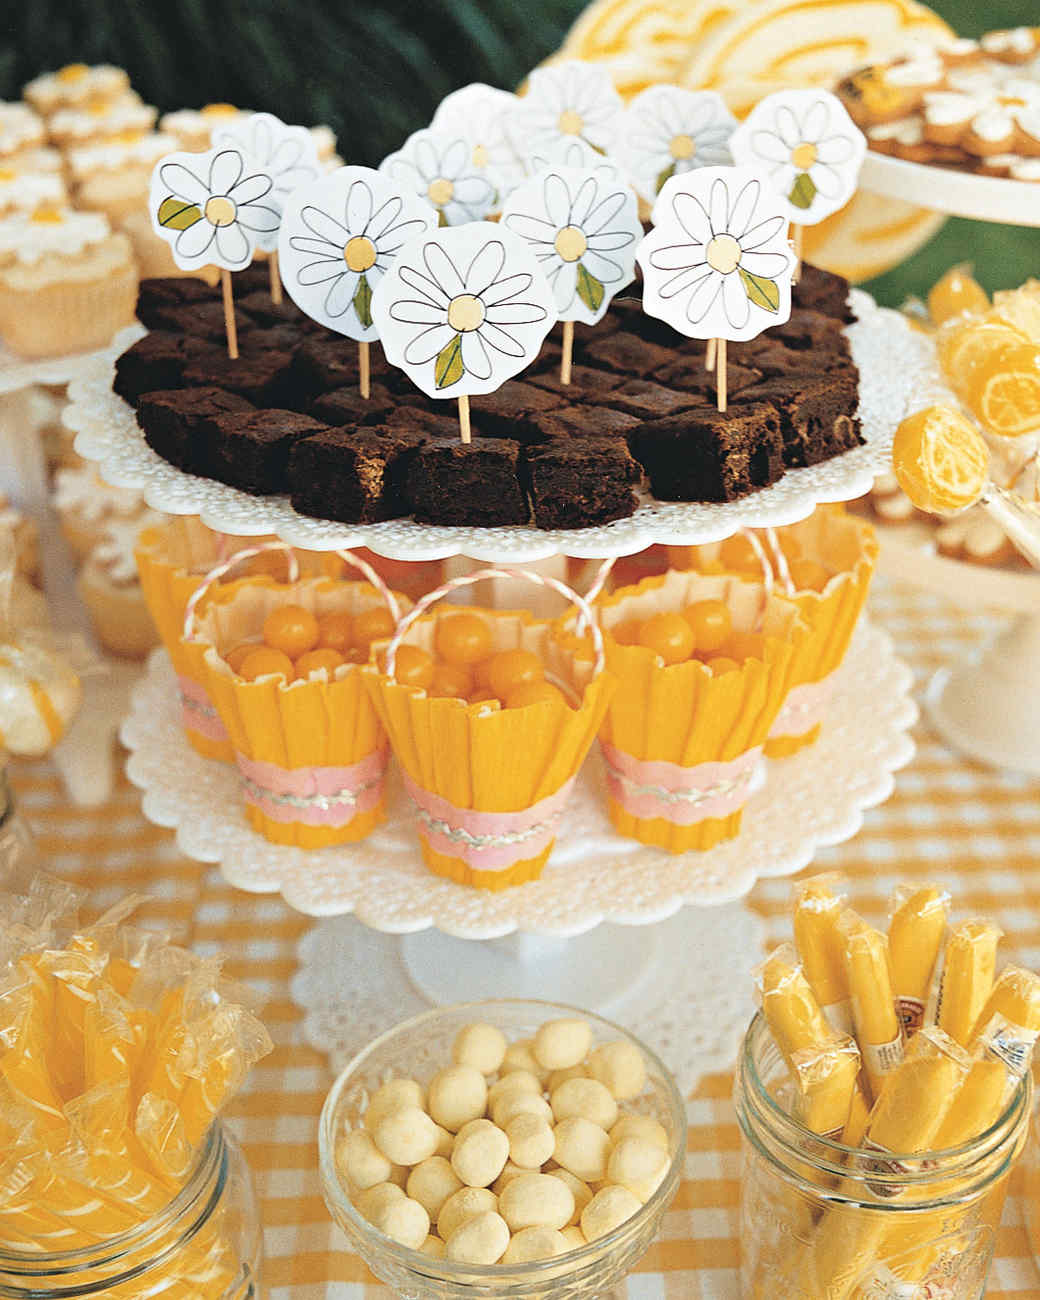 daisys-birthday-ma101007-buffet6.jpg